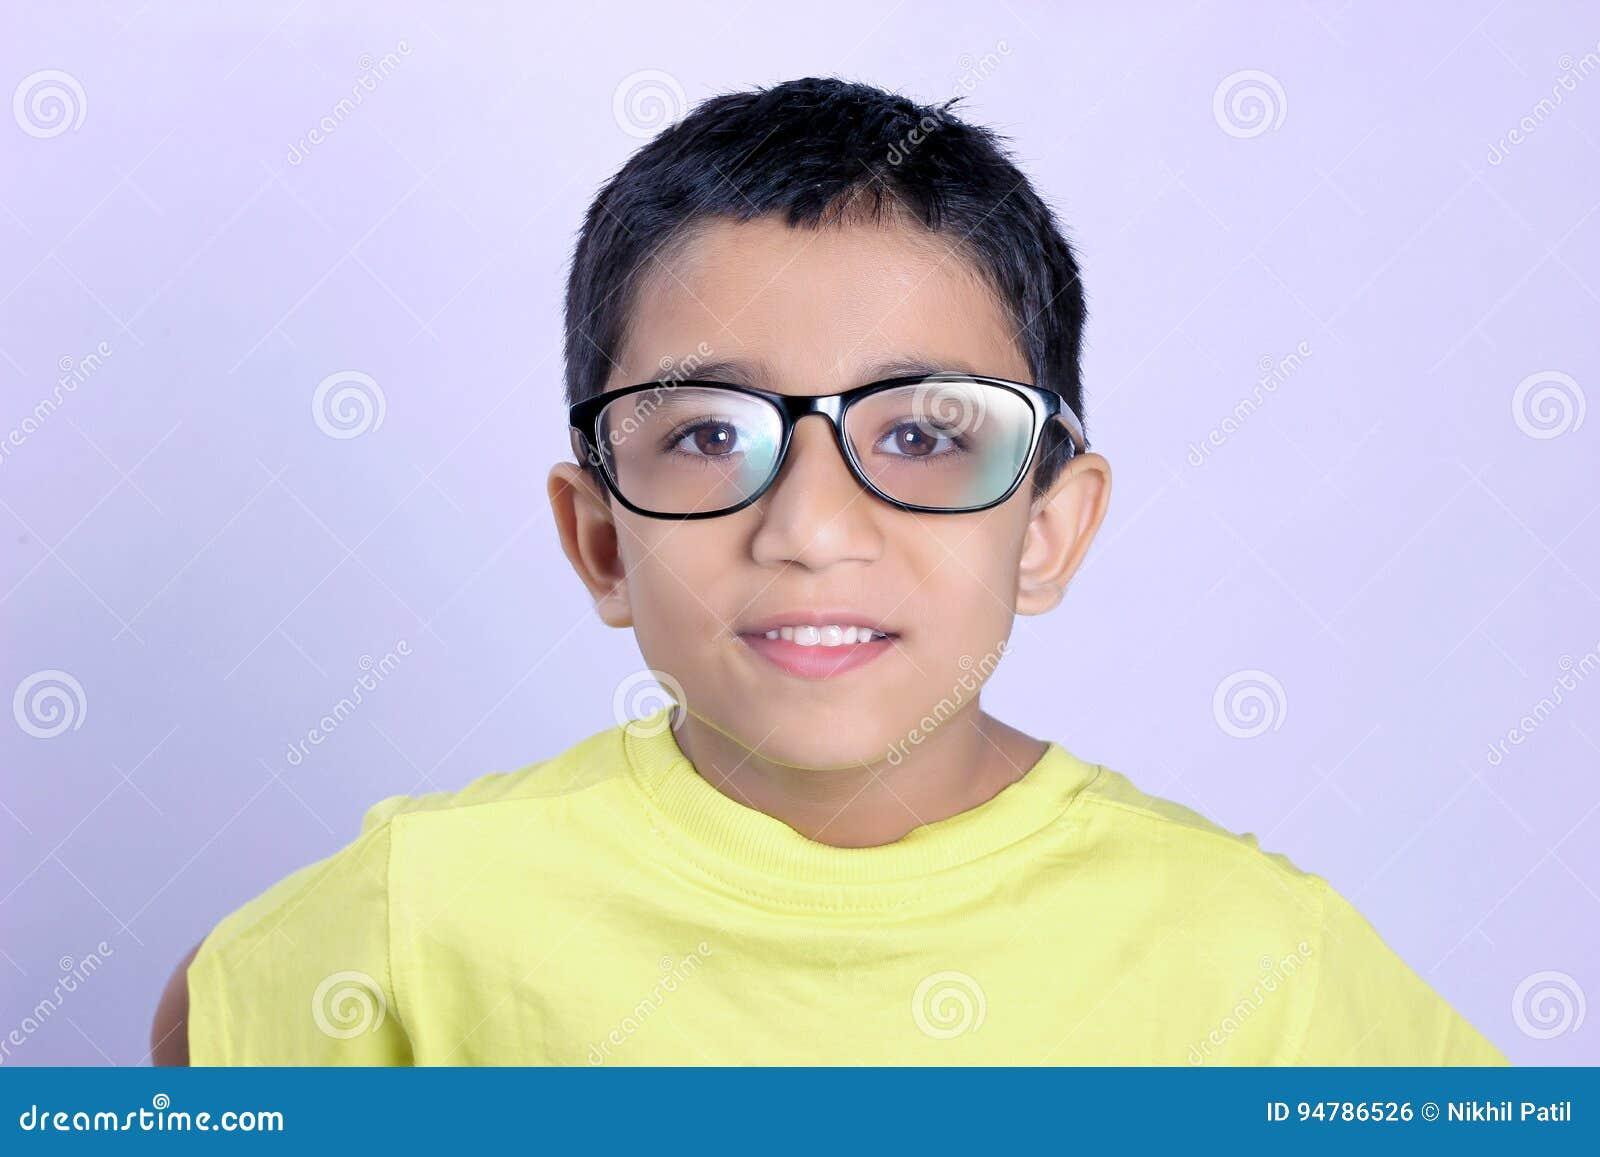 Indian child on eyeglass